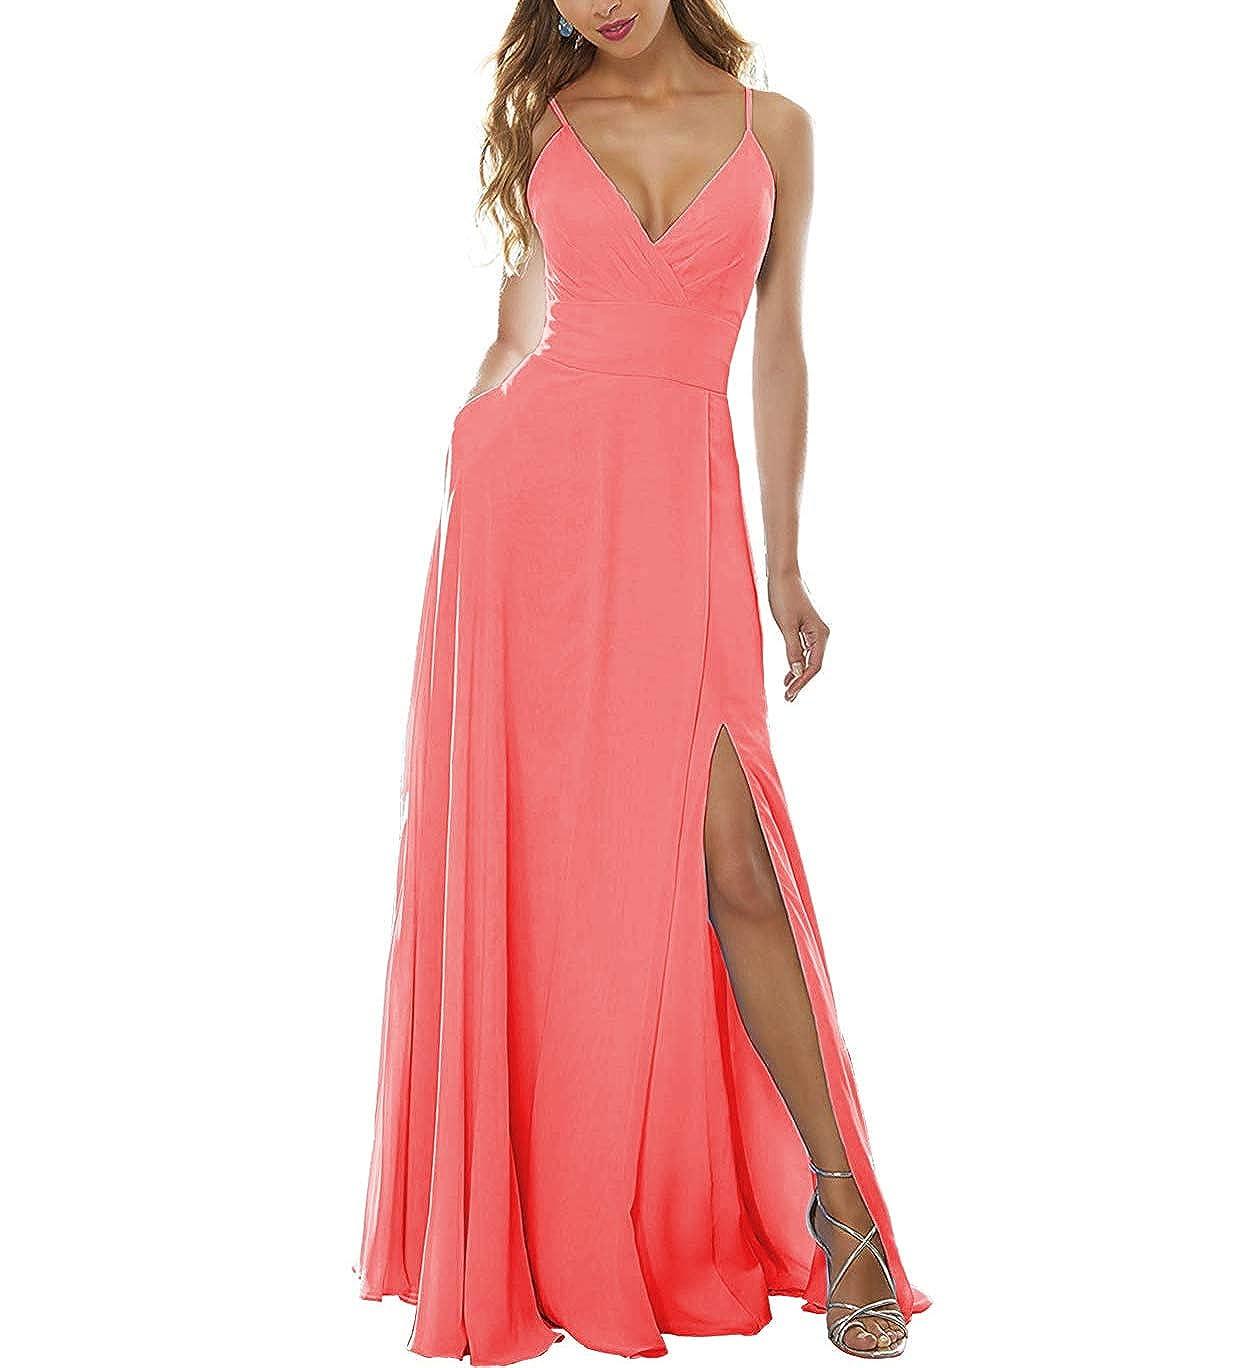 Dark Peach Stylefun Women's Side Split Bridesmaid Gowns VNeckline Spaghetti Straps Long Prom Party Dresses KN004